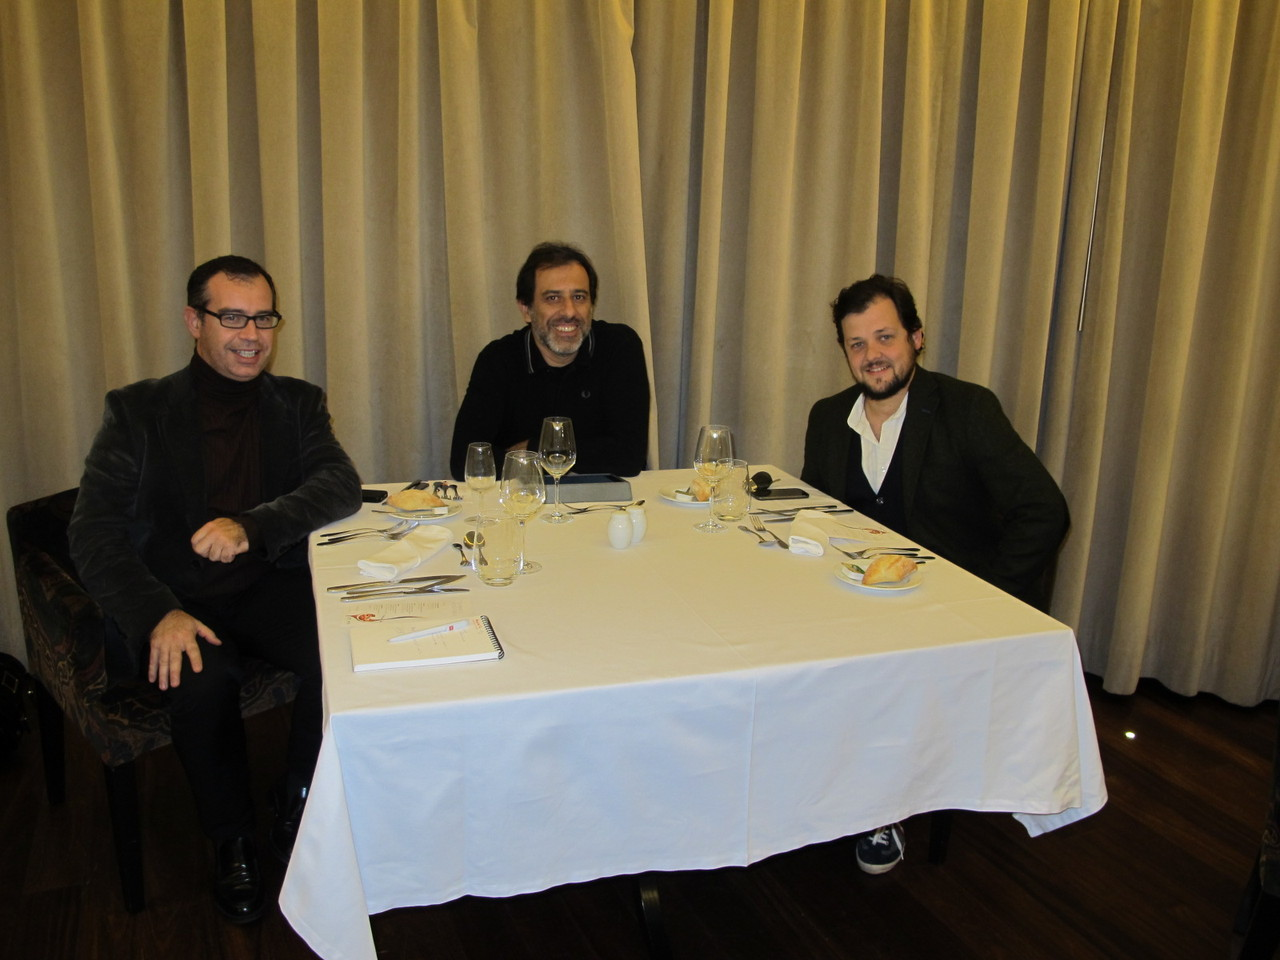 Manuel Moreira, Miguel Pires, João Rodrigues .JPG